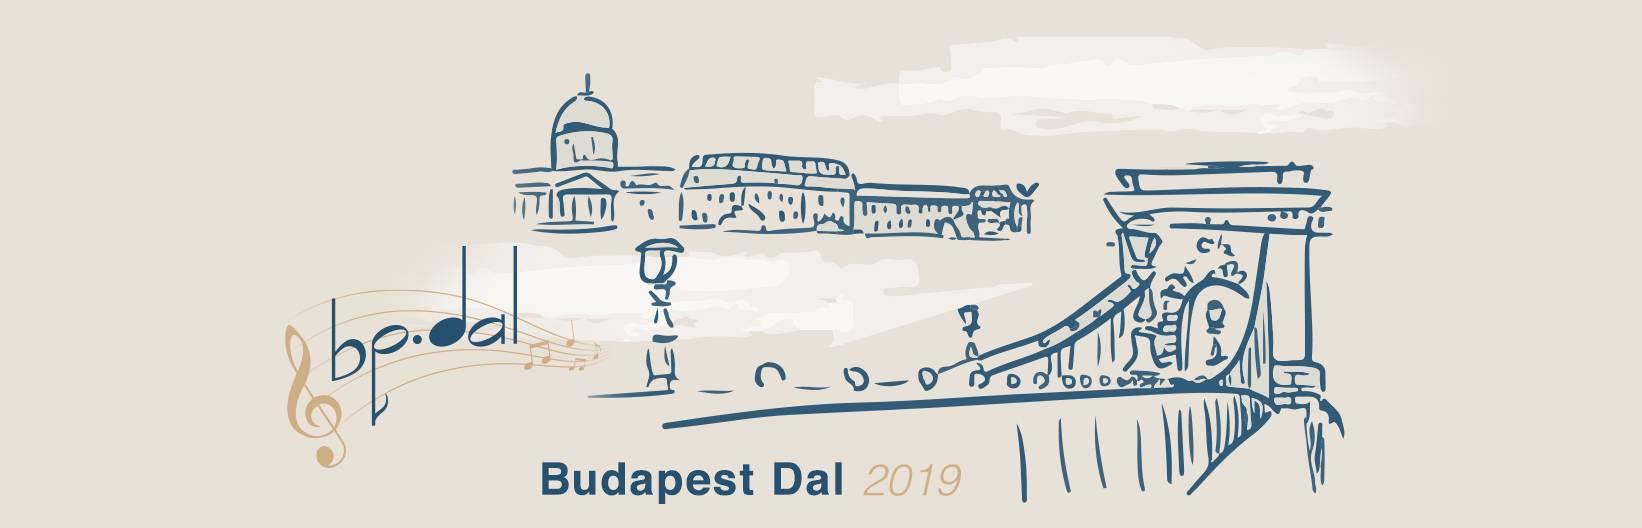 Budapest Dal 2019